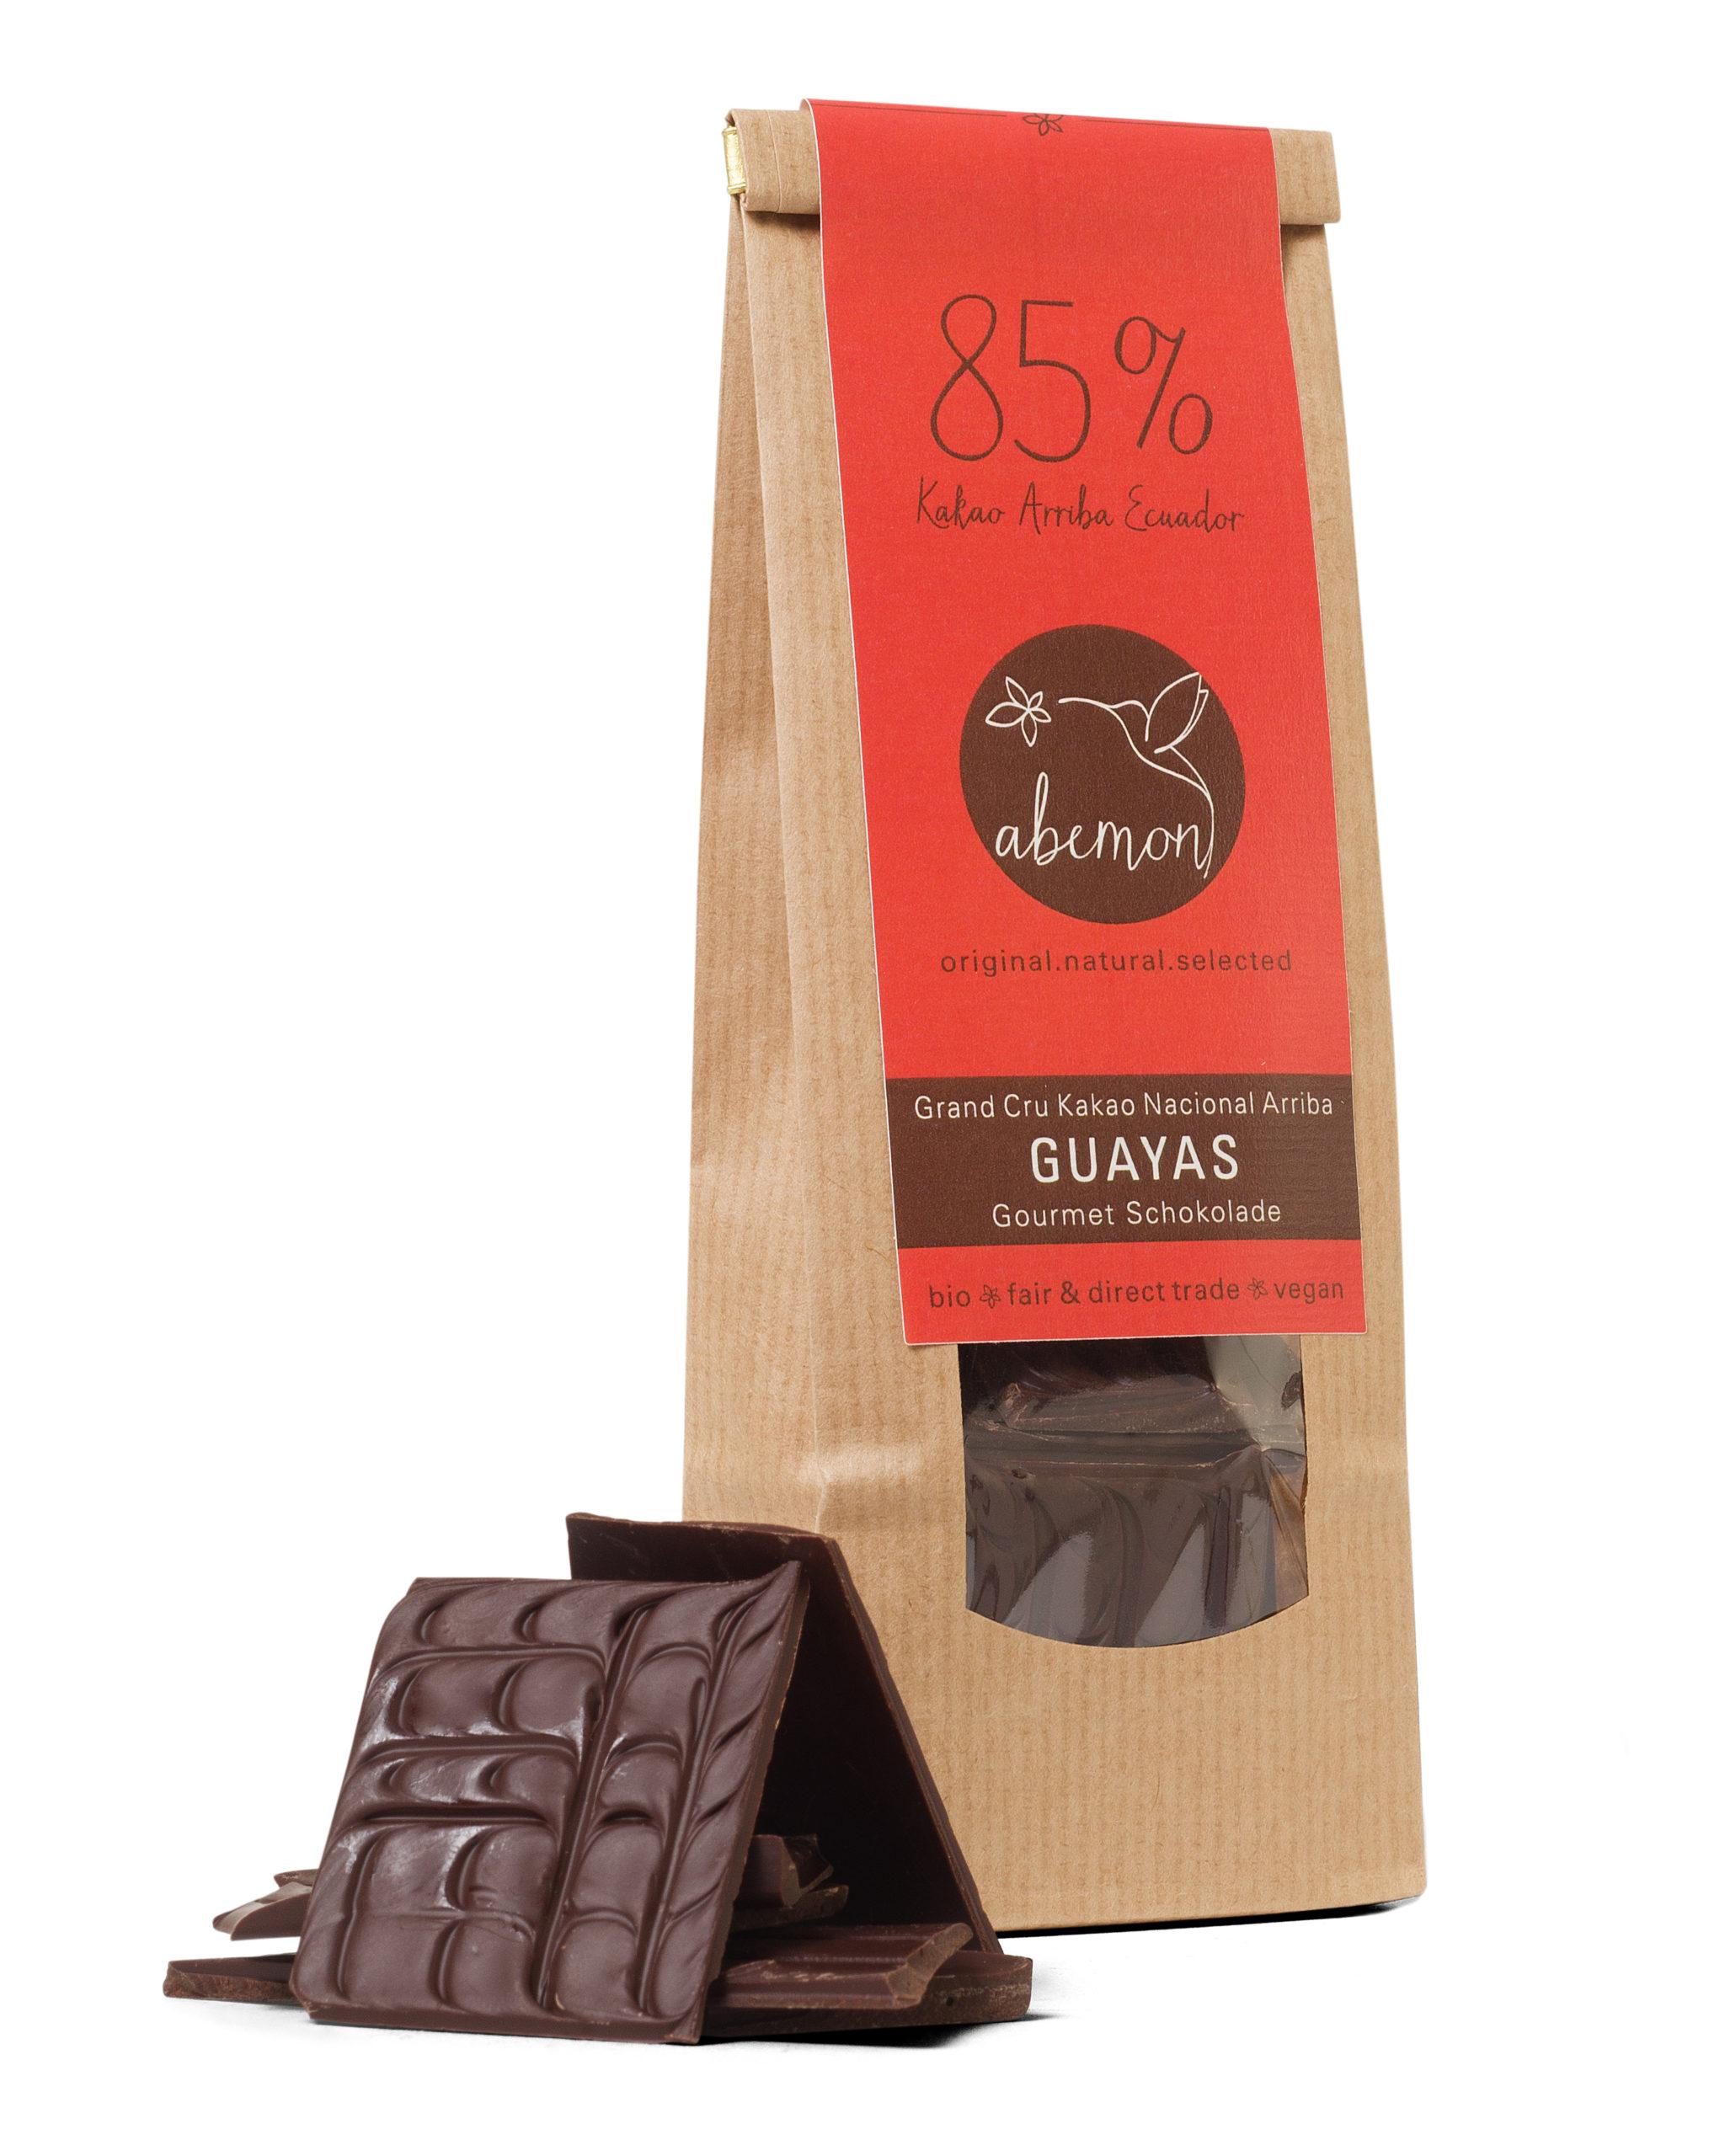 Guayas 85%